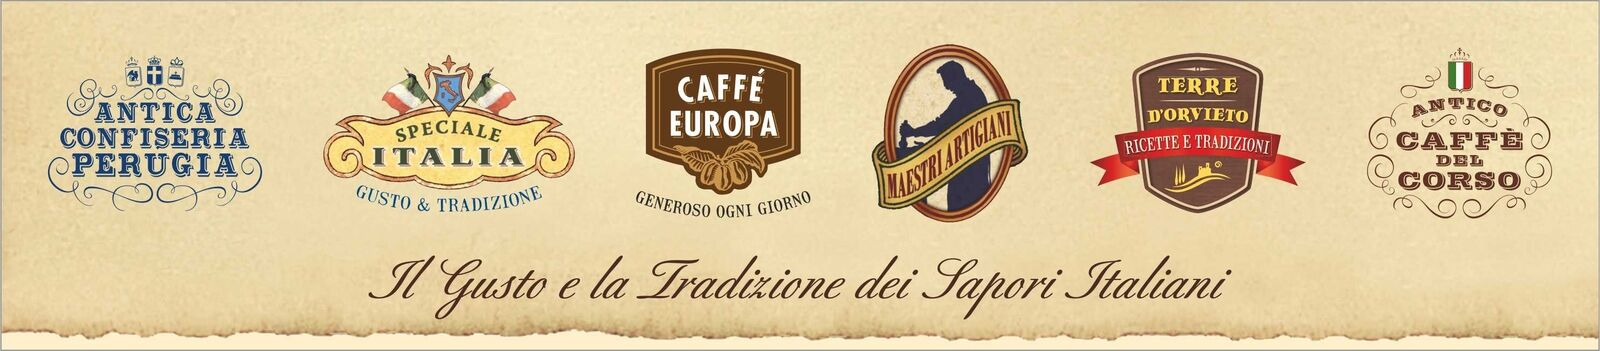 Speciale Italia Shop 2017